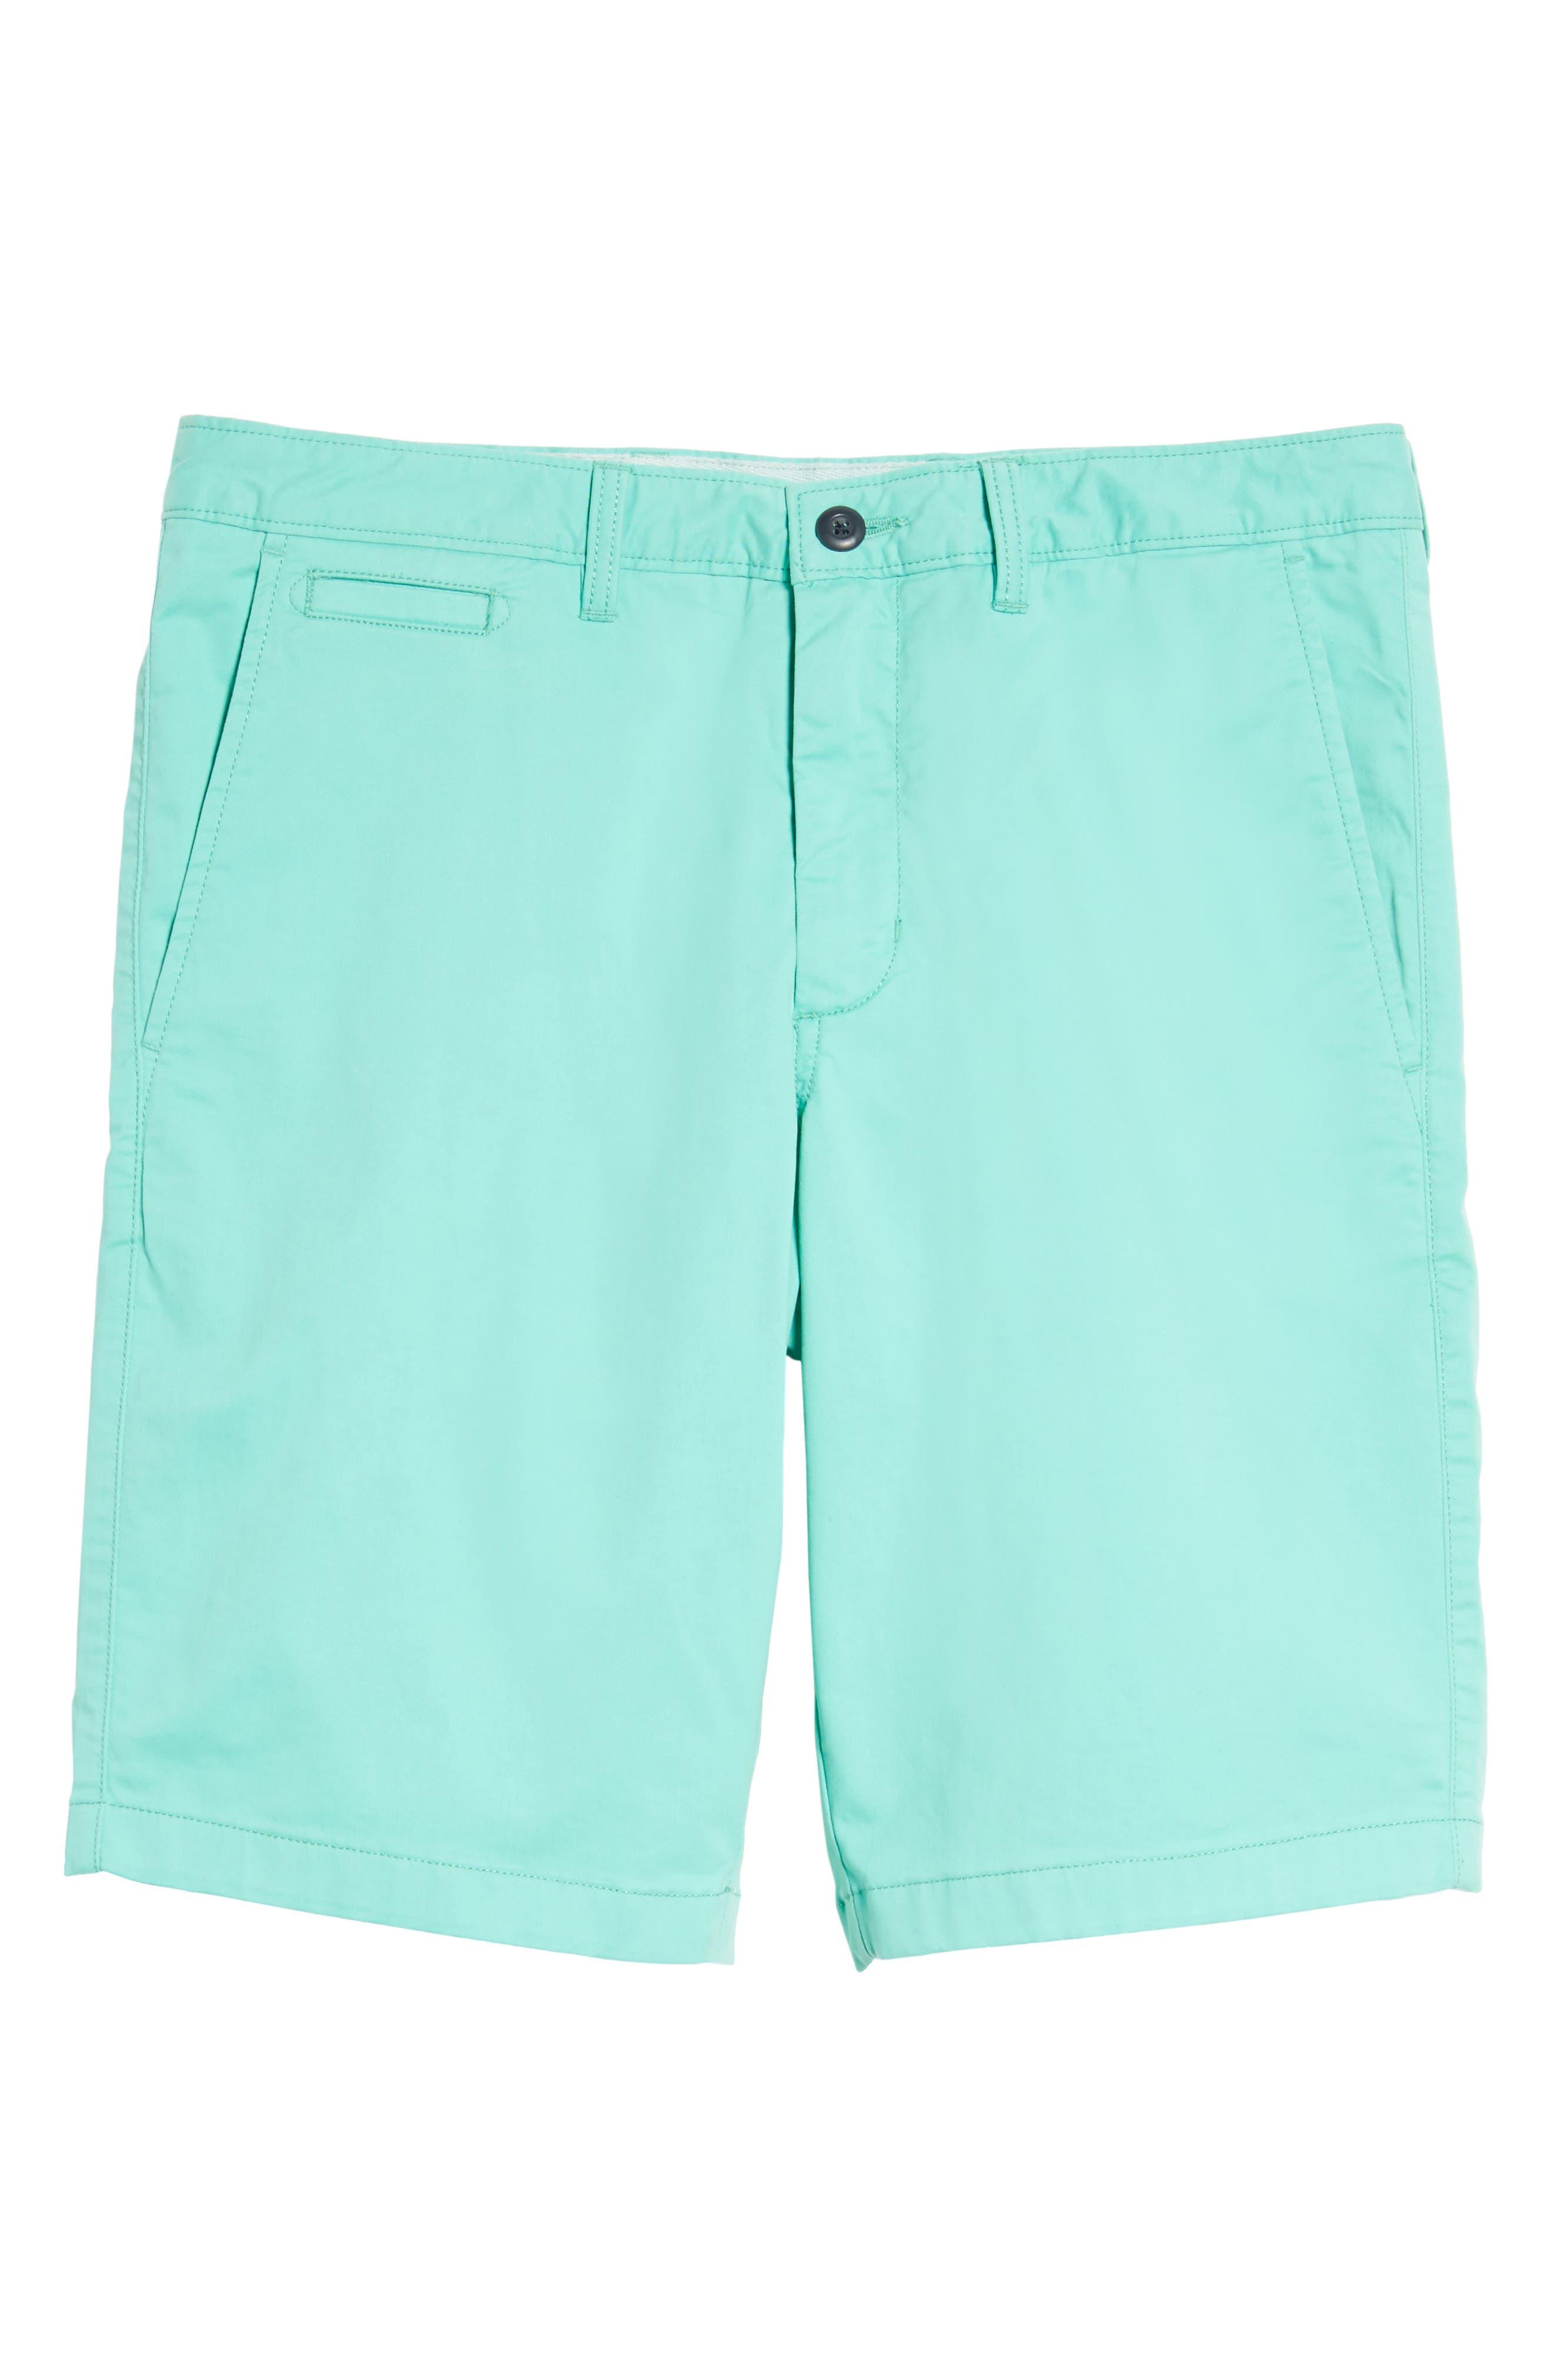 Ballard Slim Fit Stretch Chino 11-Inch Shorts,                             Alternate thumbnail 81, color,